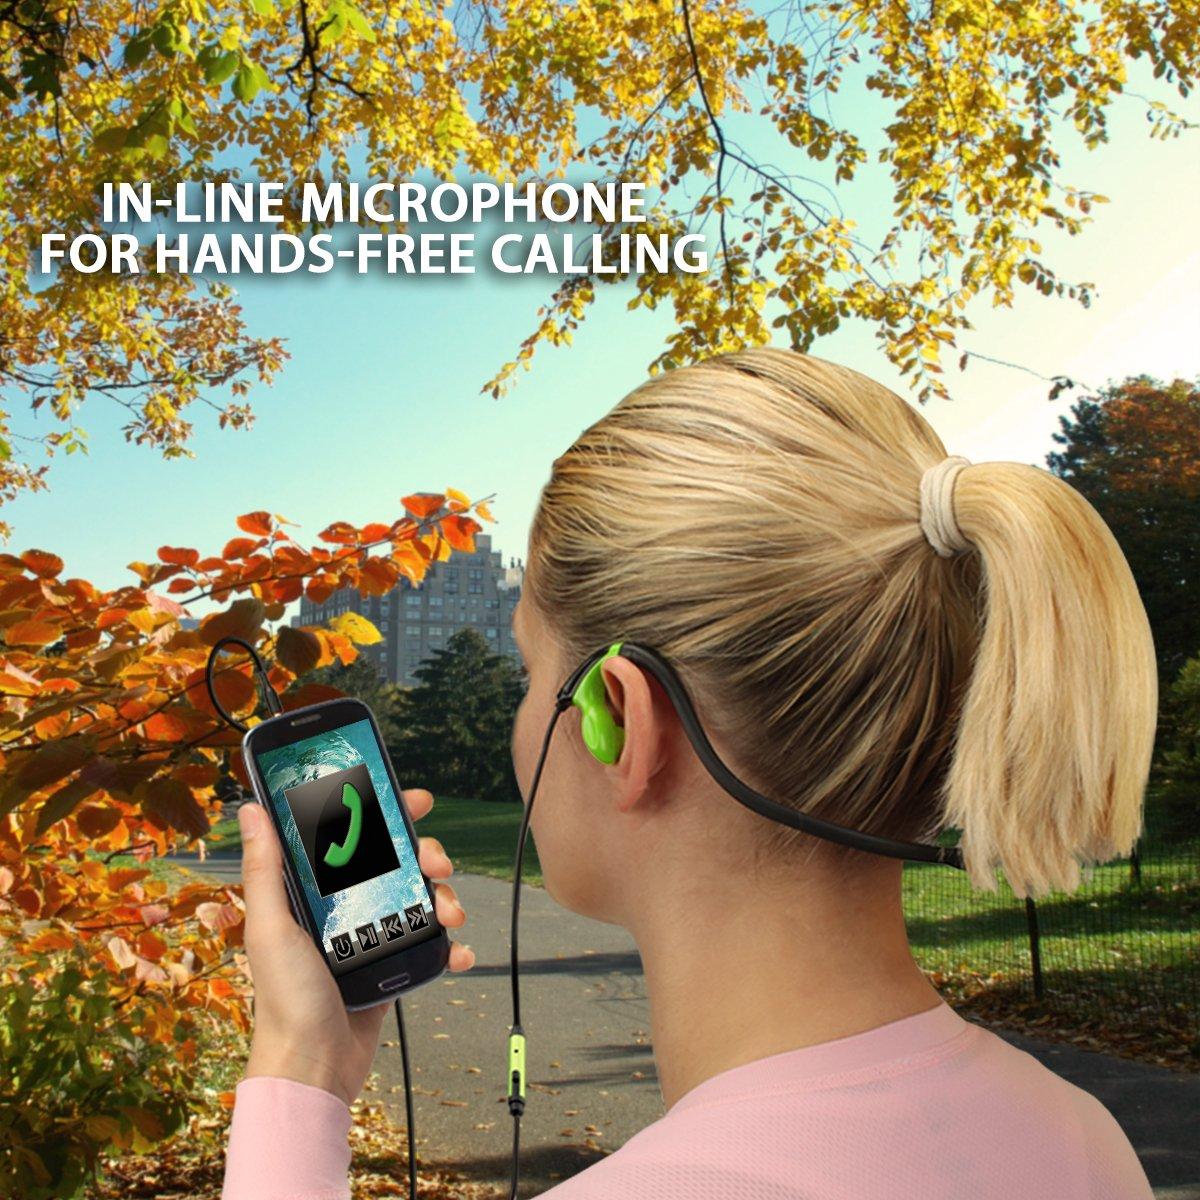 Iphone 6s earphones with microphone - wired earphones with earhook